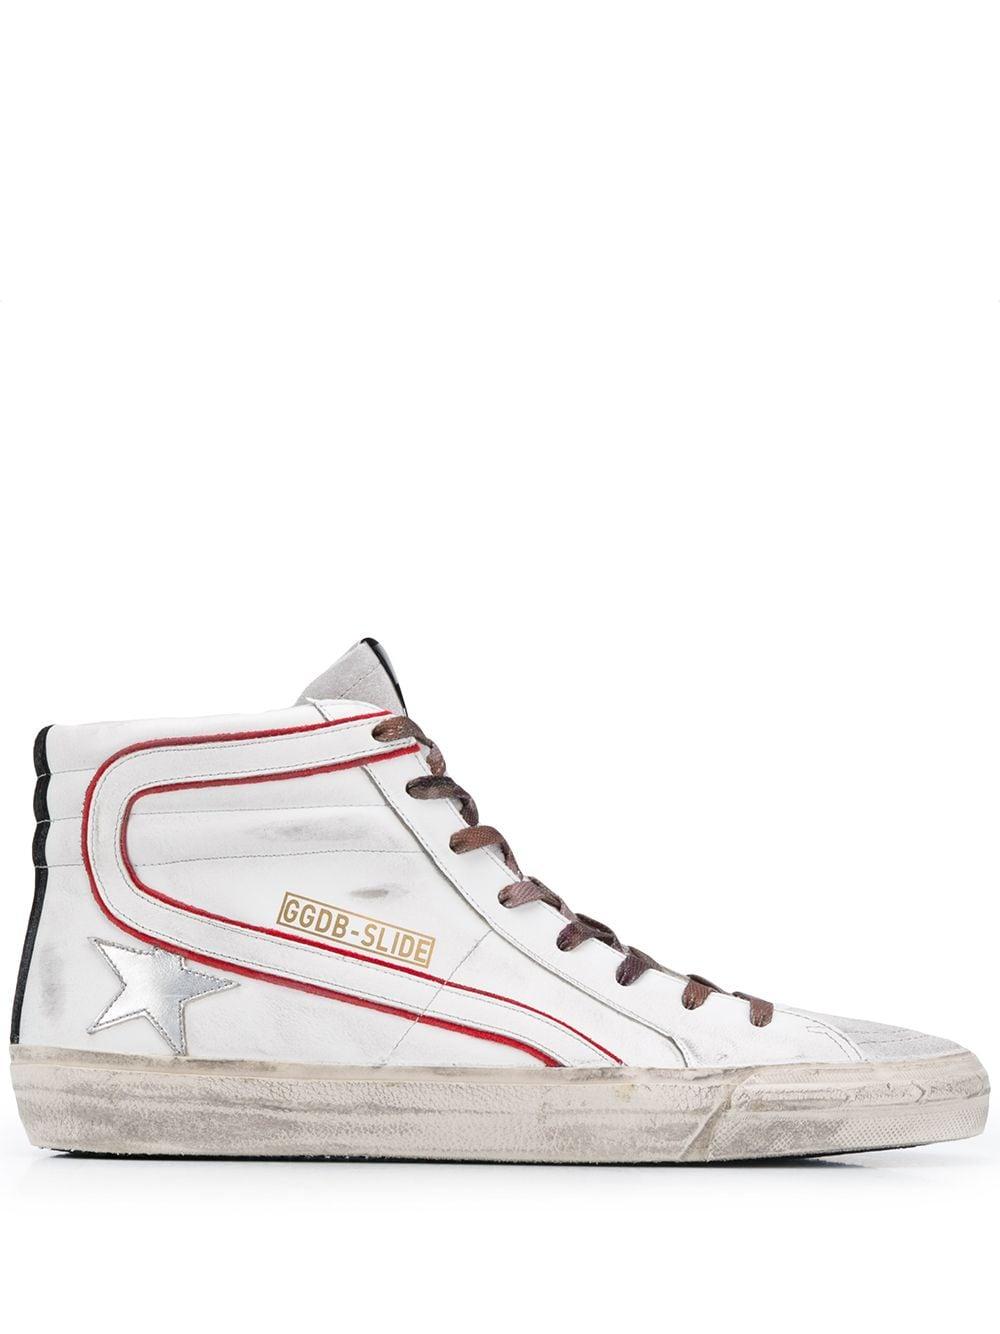 Picture of Golden Goose Deluxe Brand | Slide High-Top Sneakers